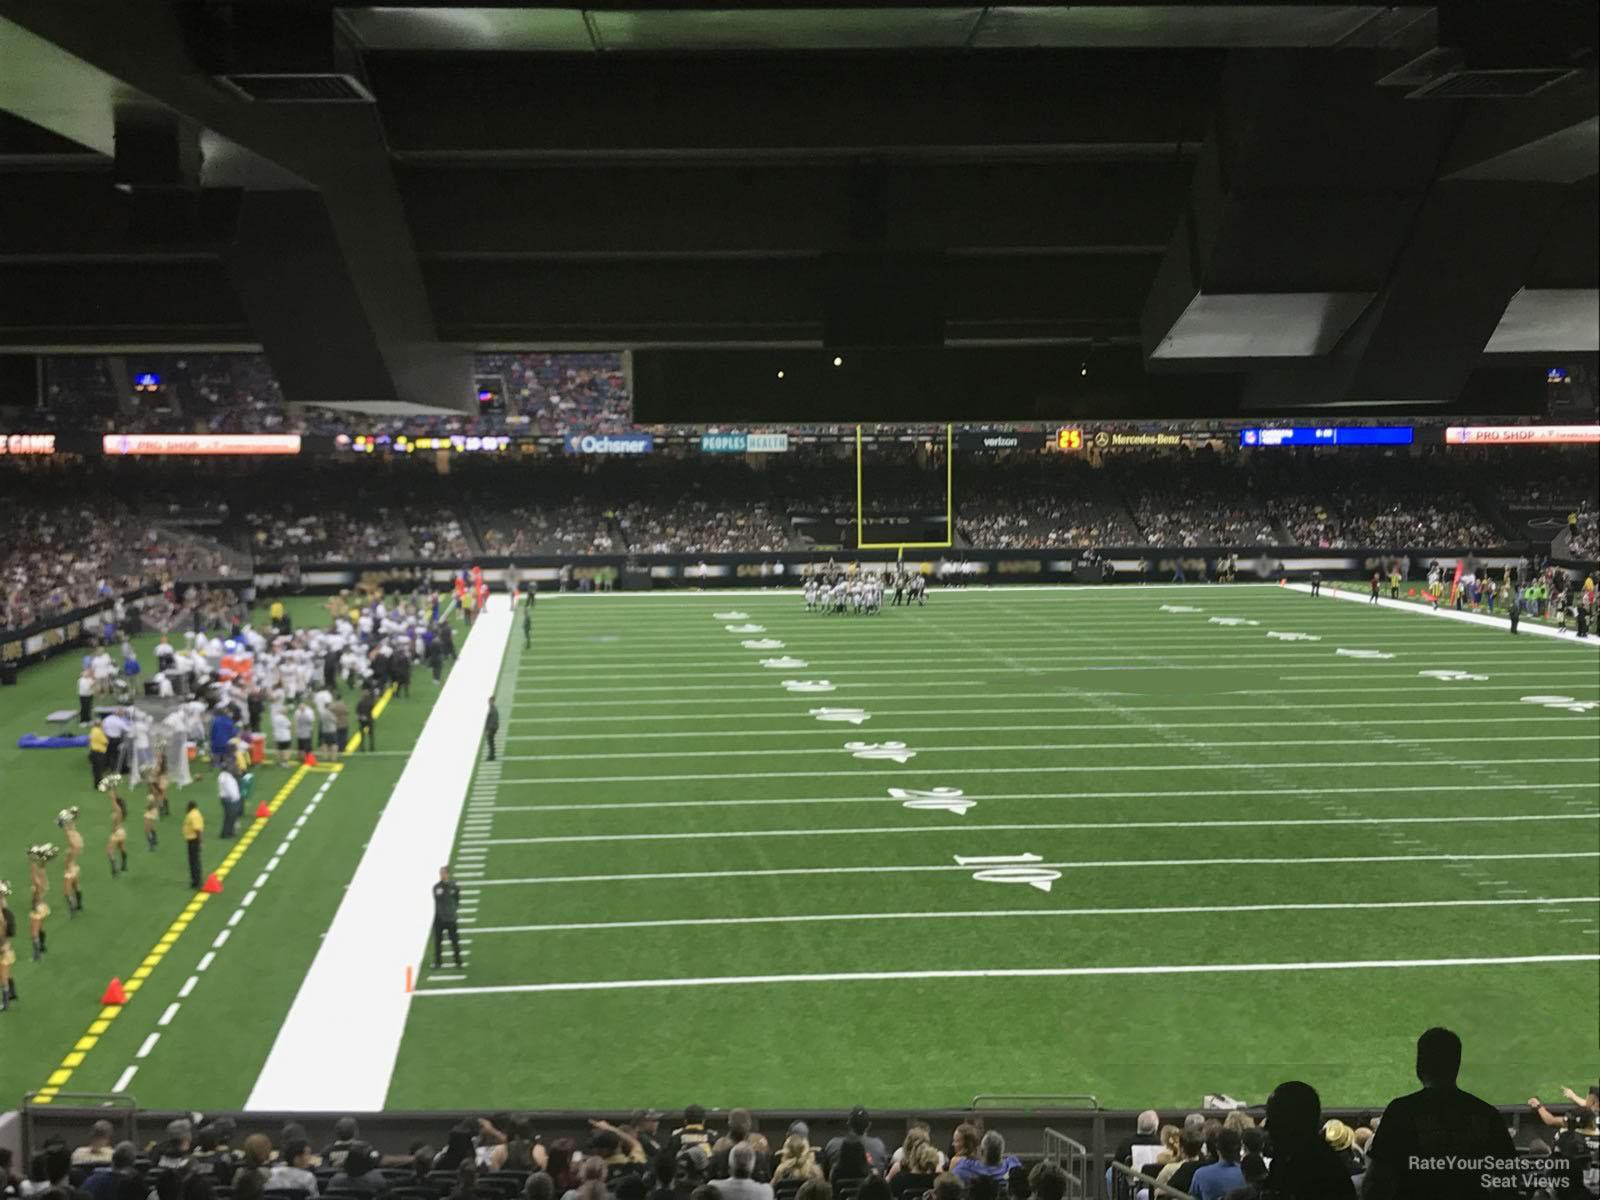 Superdome Section 104 - New Orleans Saints - RateYourSeats.com